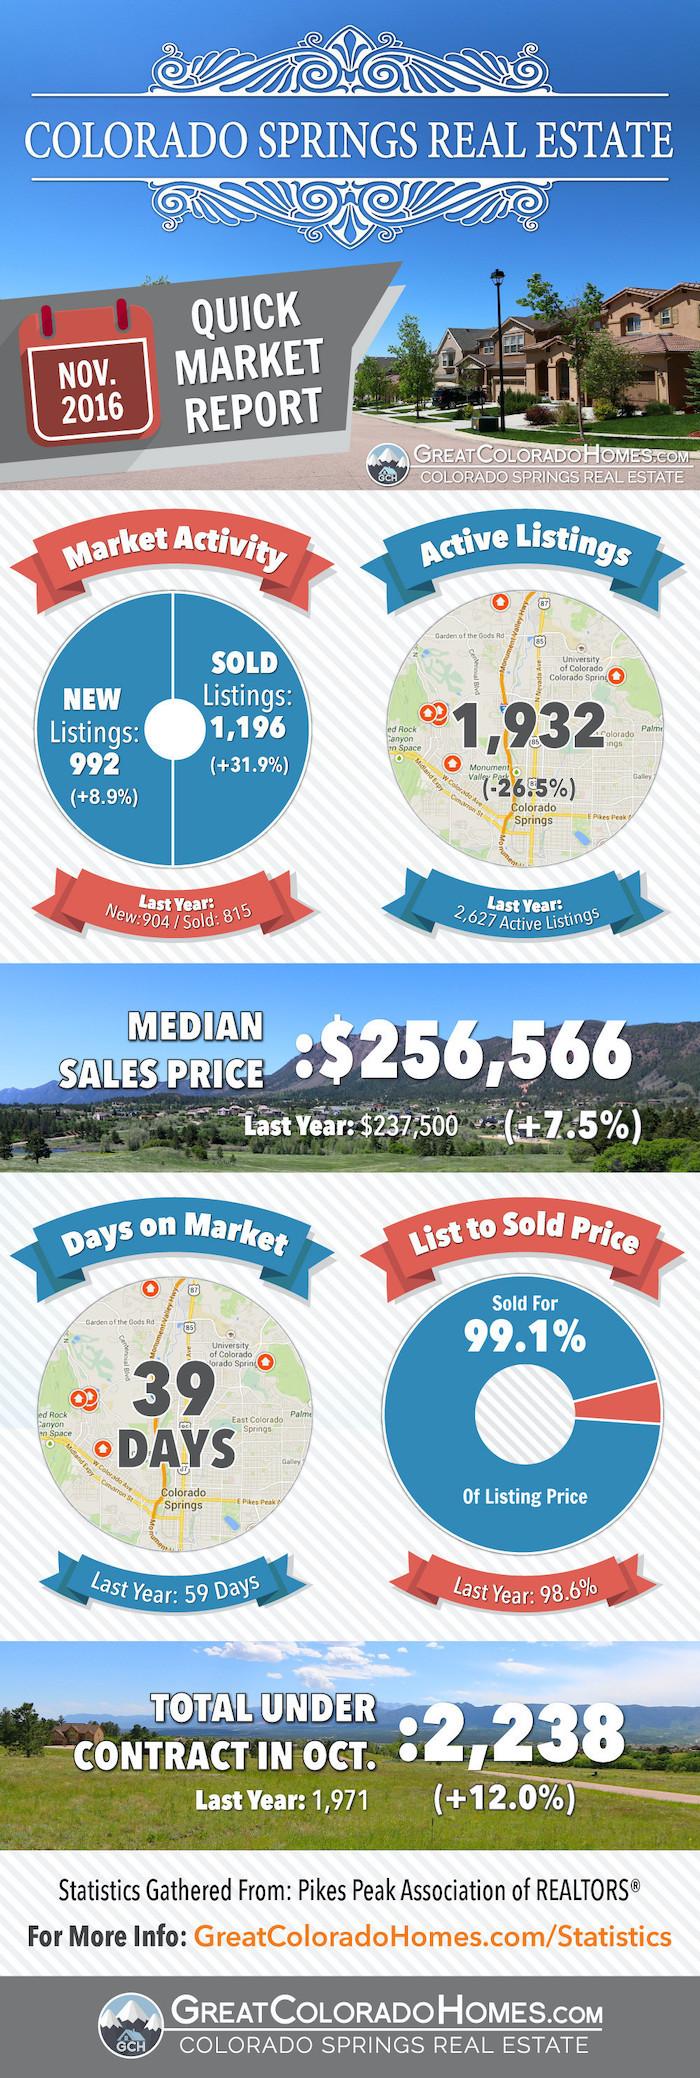 November 2016 Colorado Springs Real Estate Market Report